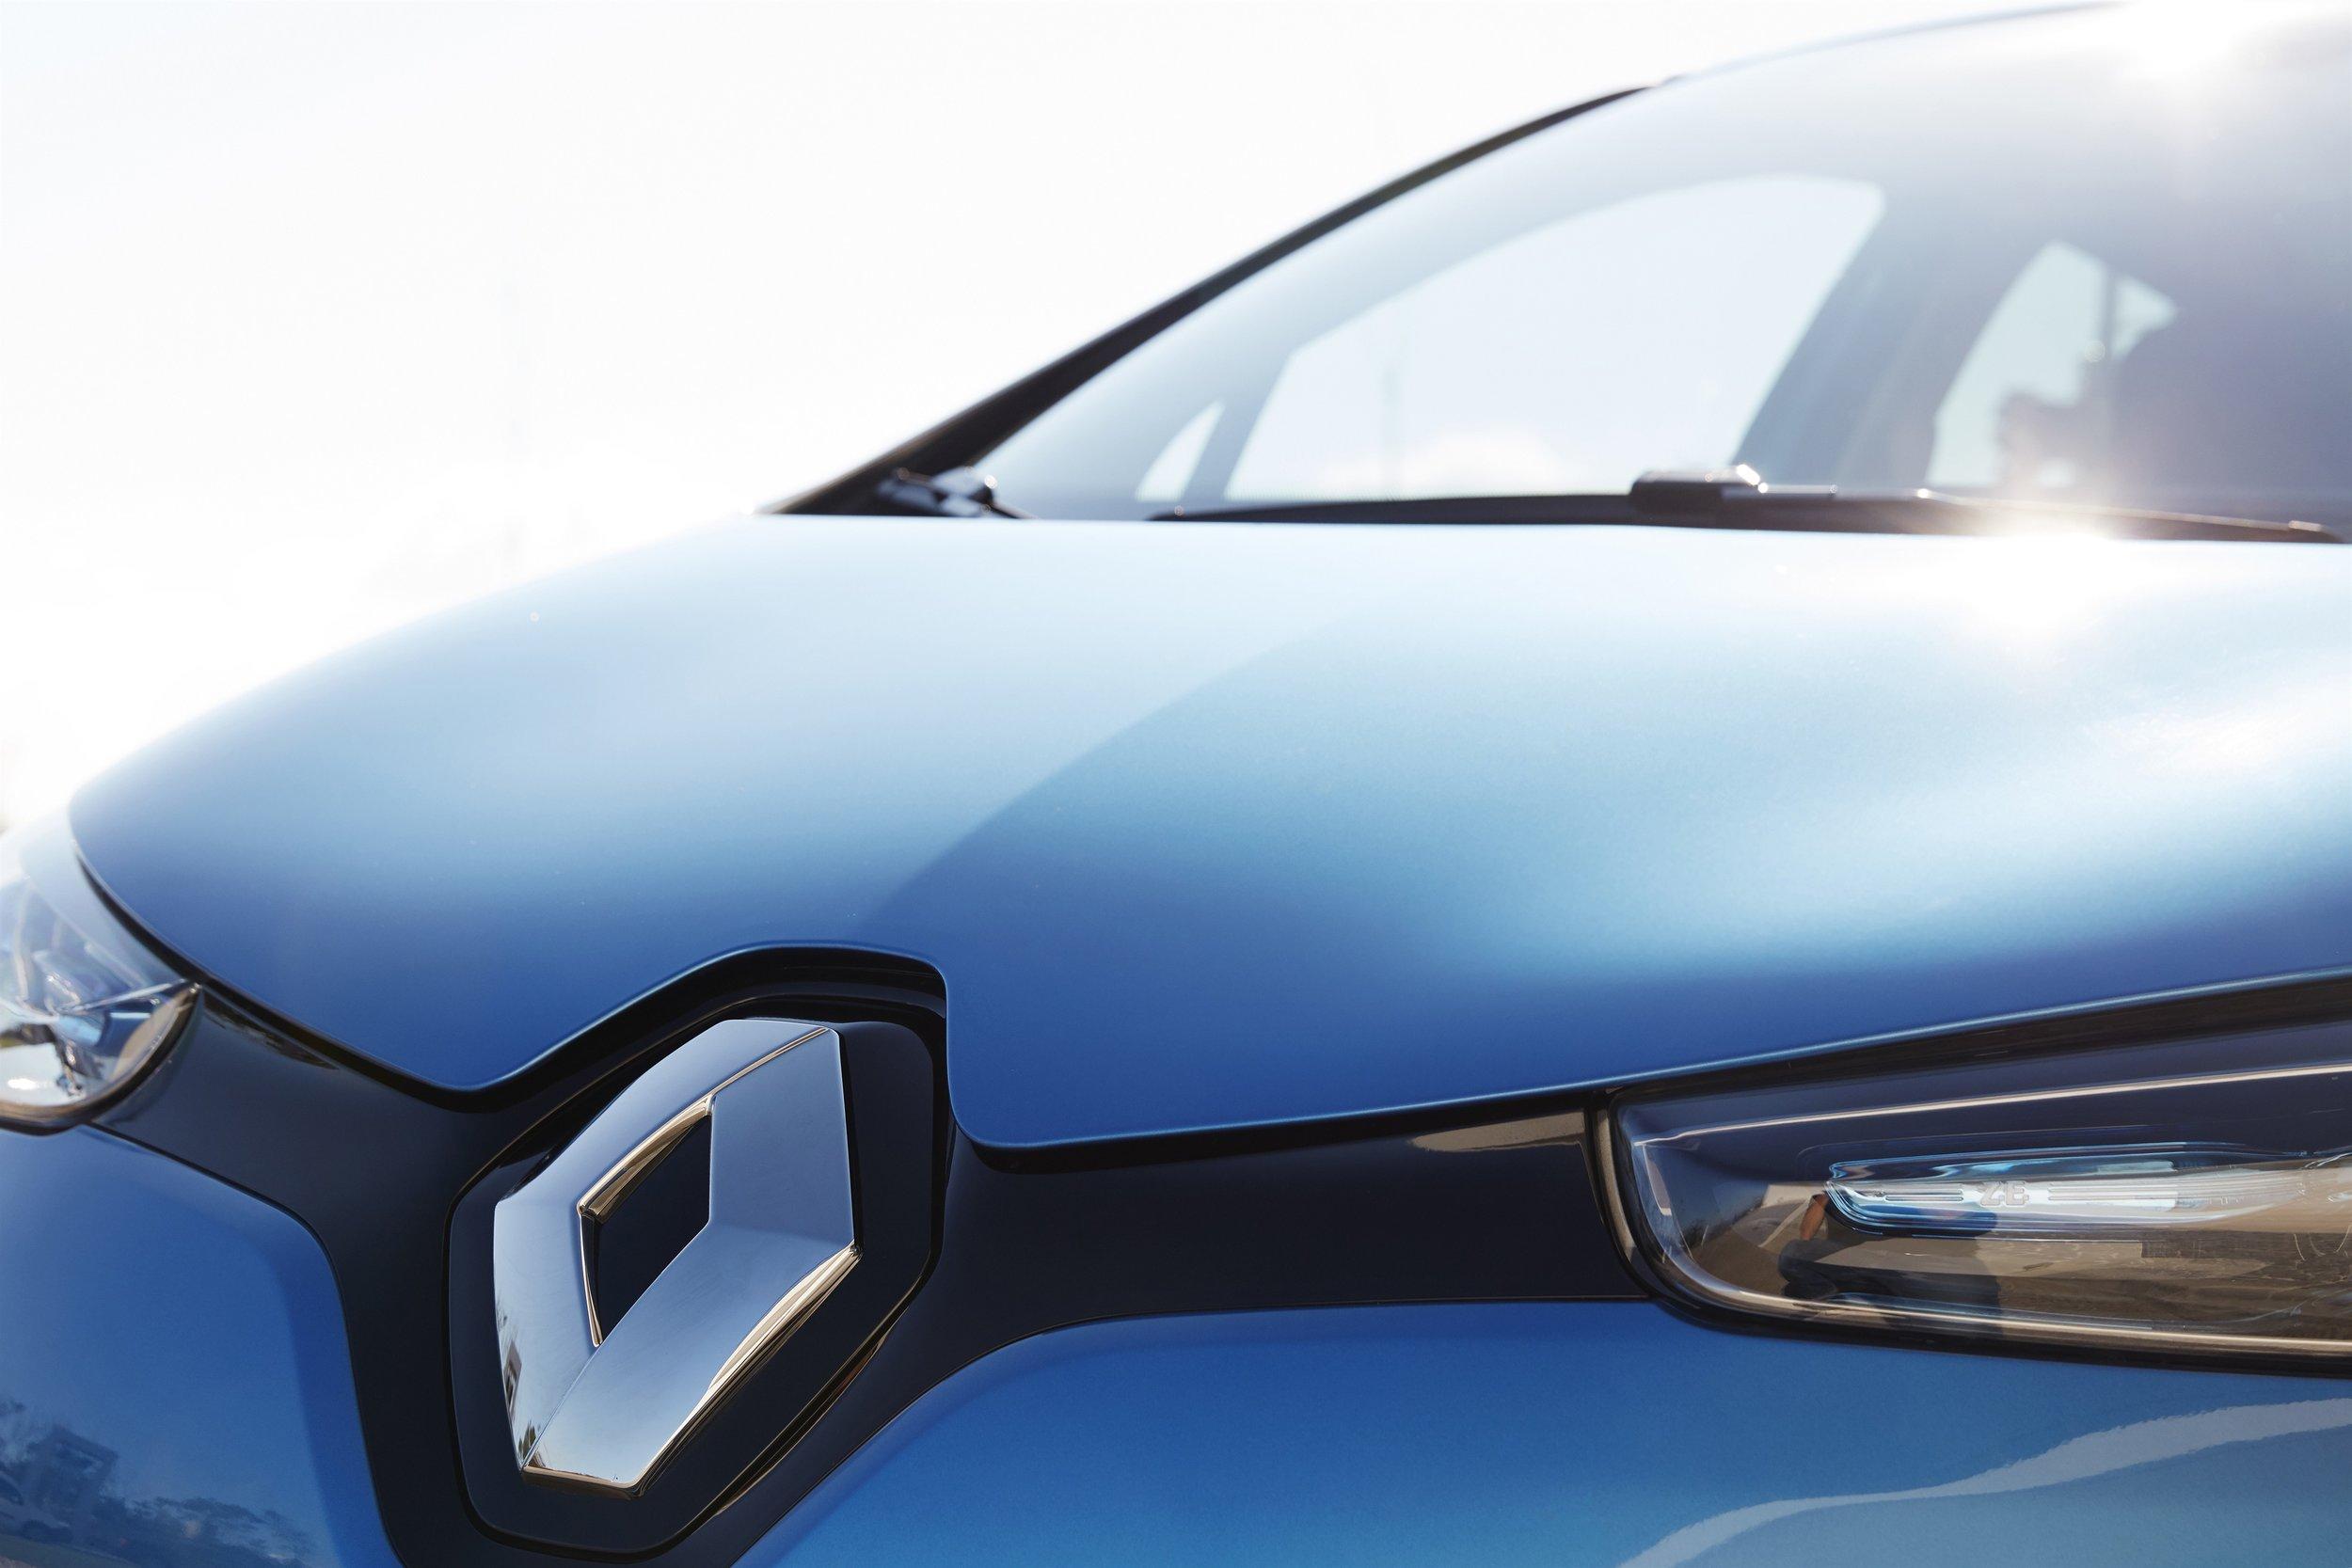 85041_2016_-_New_Renault_ZOE_Z_E_40_drive_tests_in_Portugal.jpg